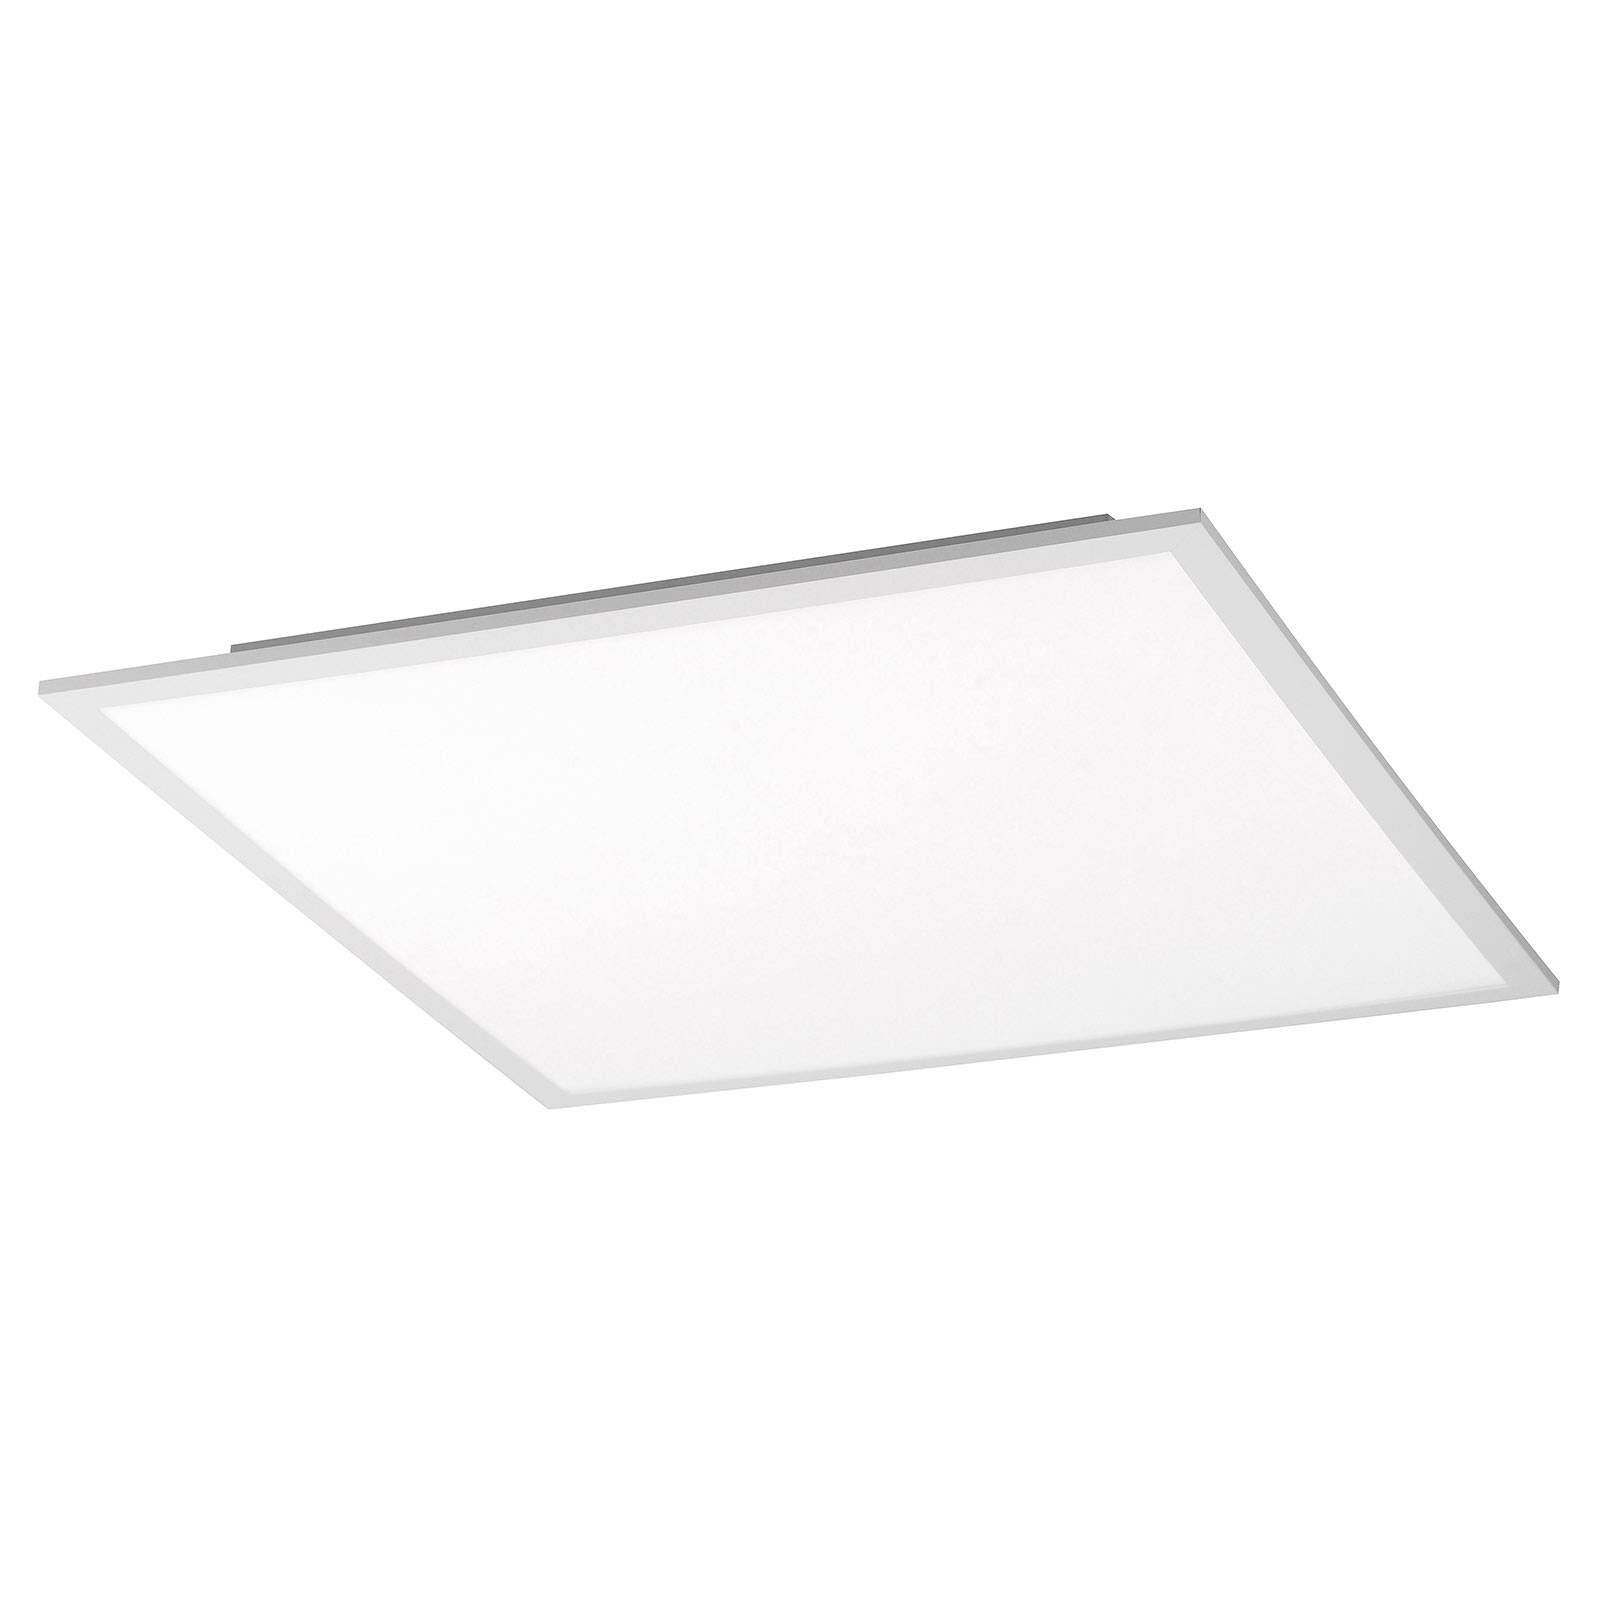 LED plafondlamp LOLAsmart Flat, 45 x 45 cm